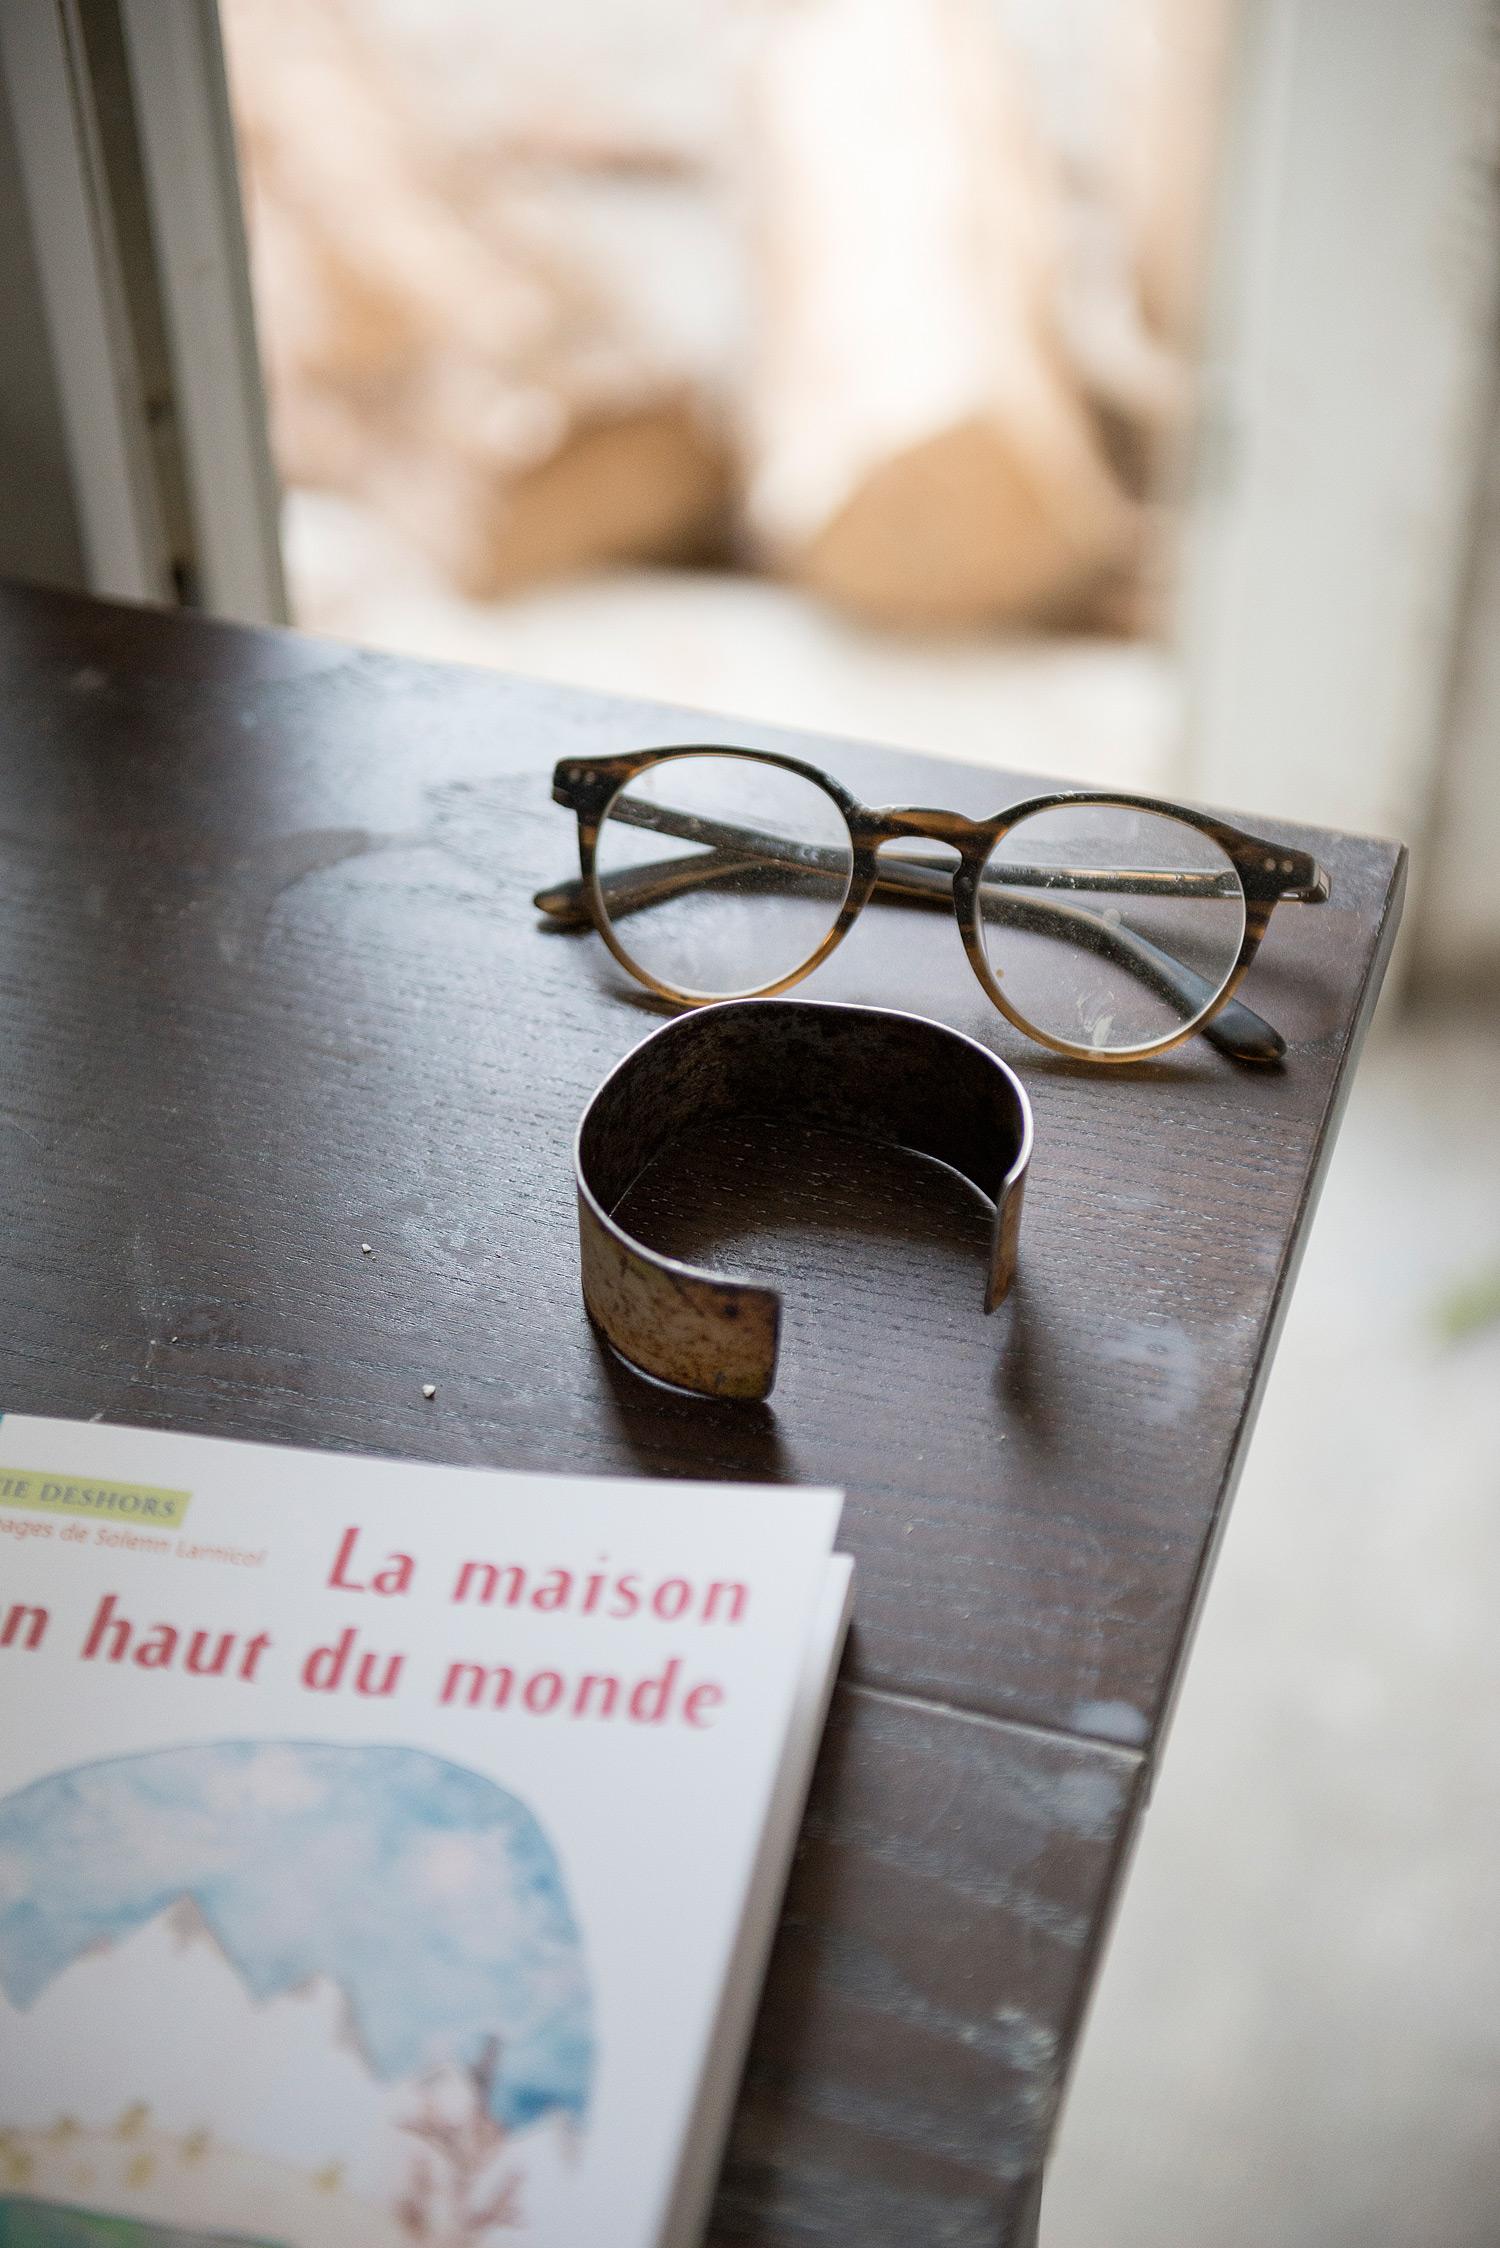 Solenn-larnicol-ceramiste-illustratrice-illustration-dessin-livre-jeunesse-interview-etonnantes-nantes-solenn-cosotti-remy-lidereau-photographie